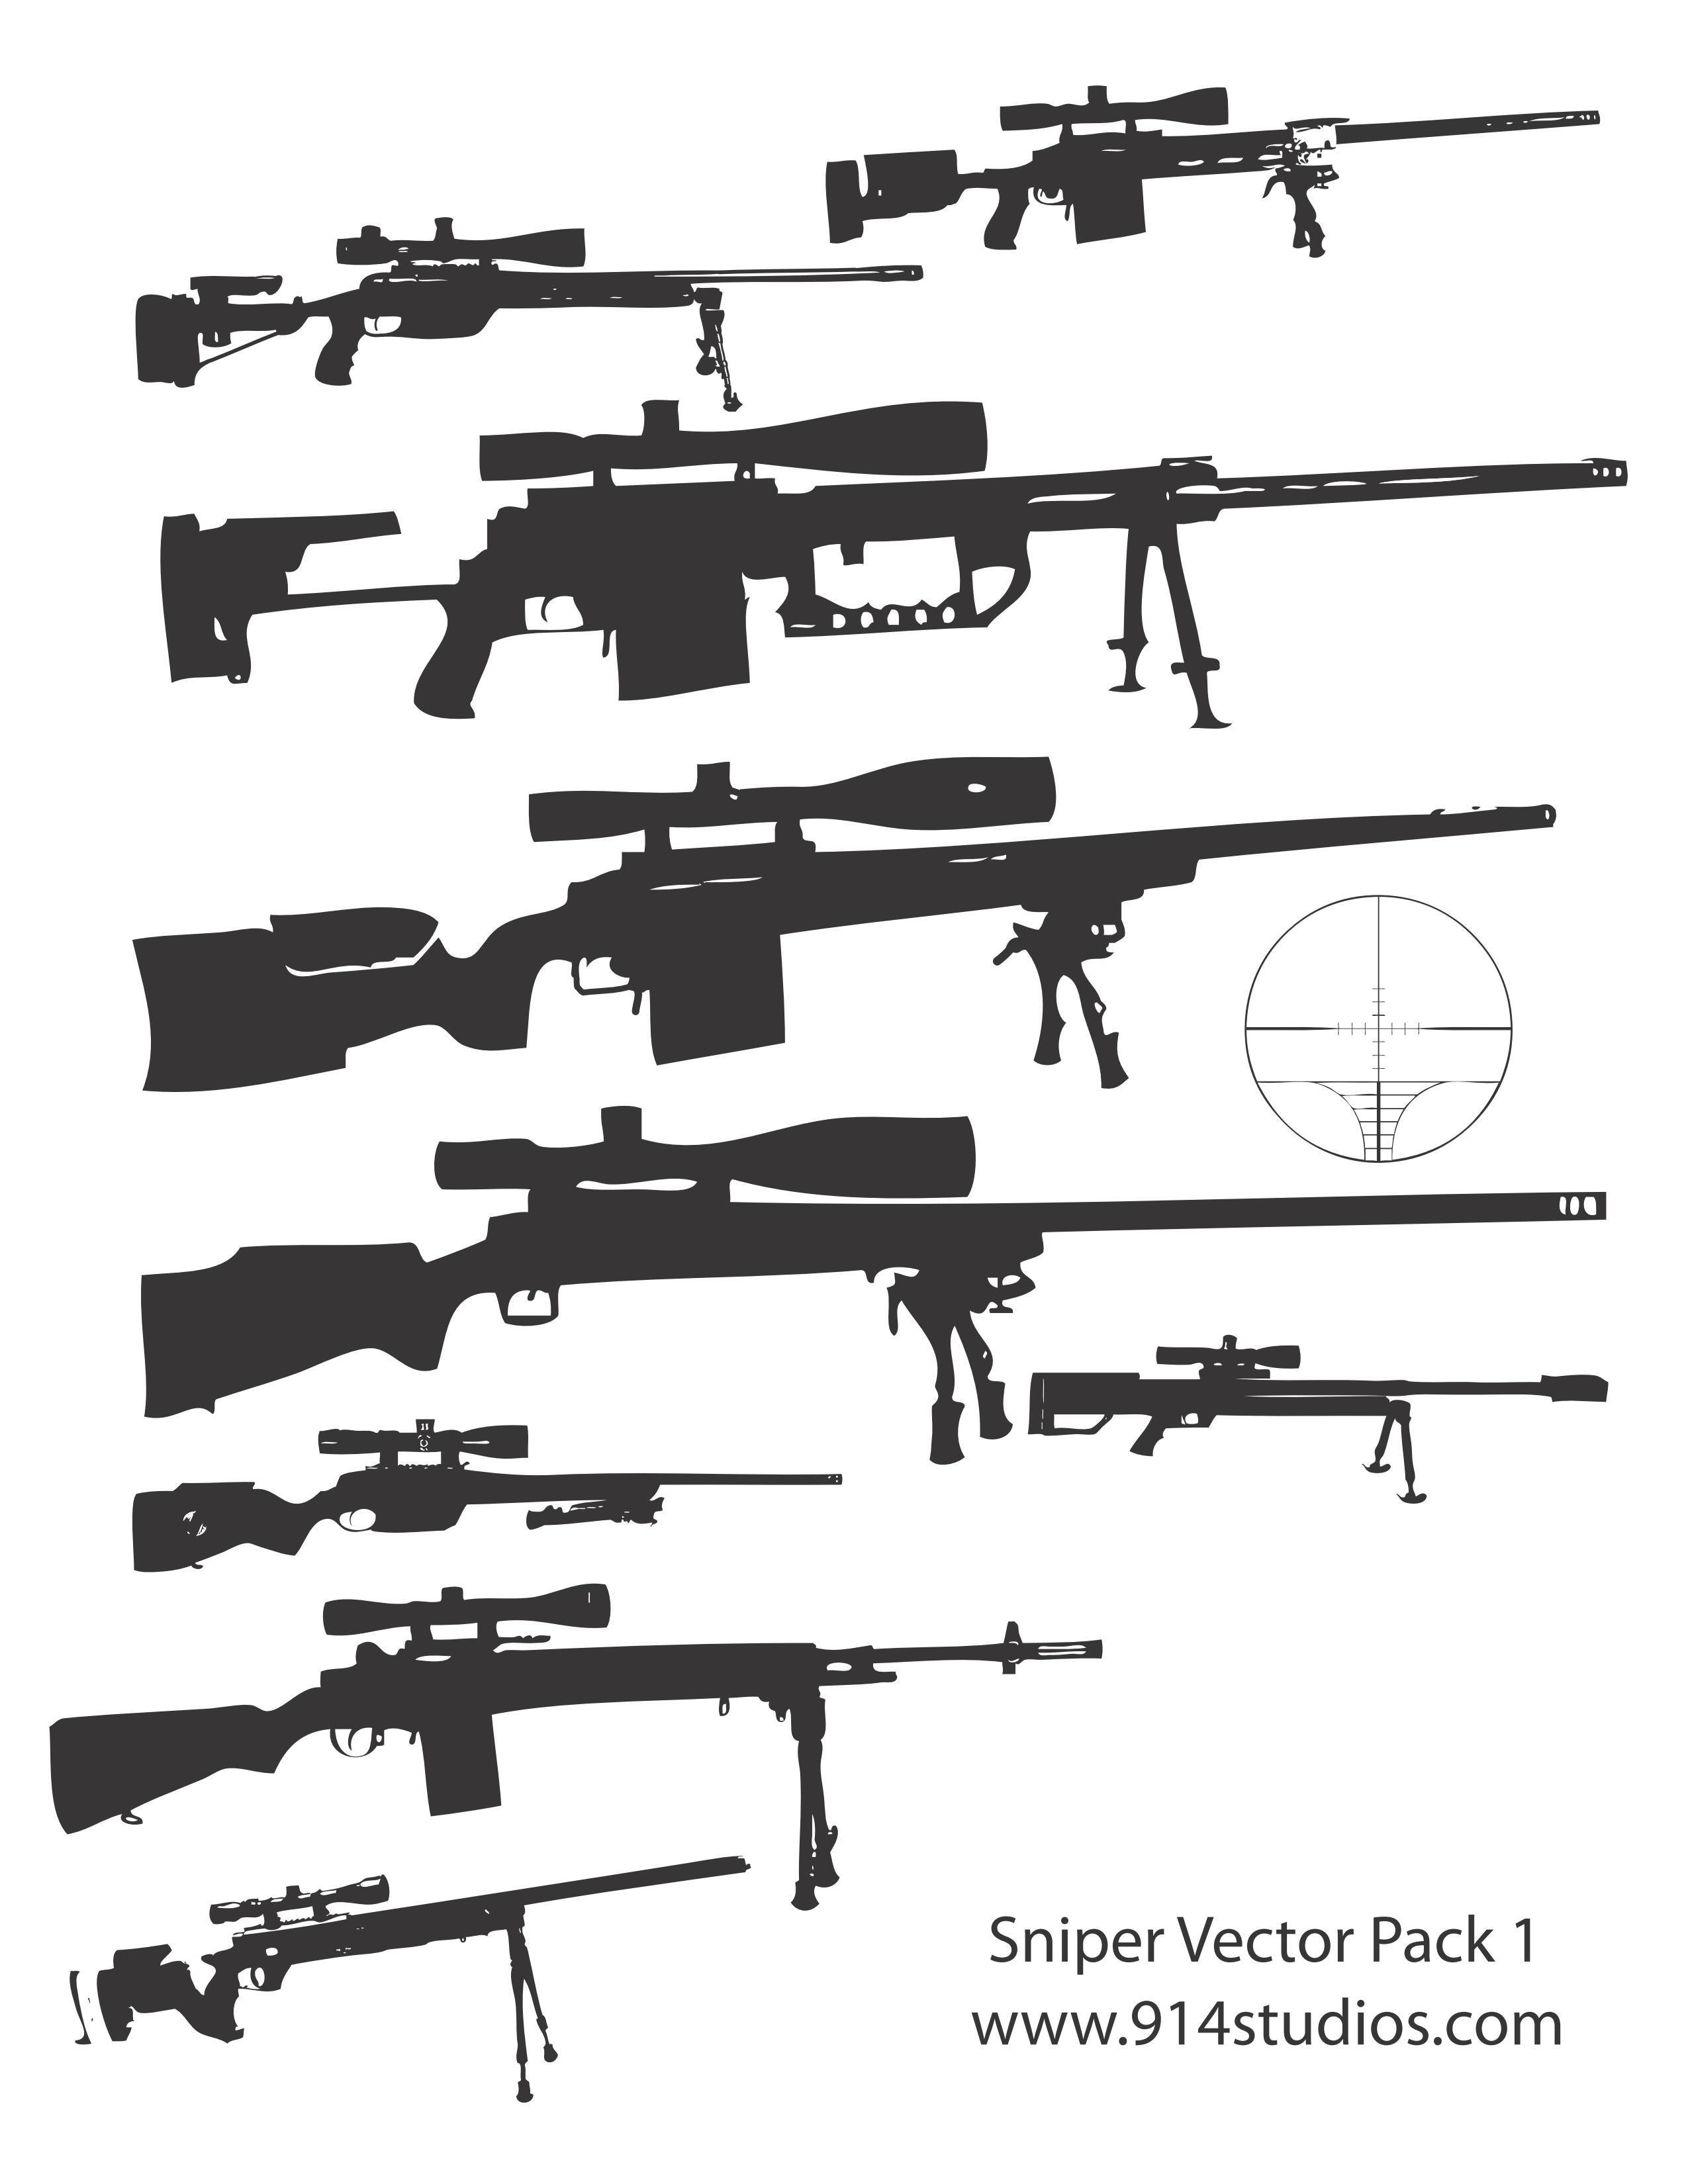 Drawn snipers uzi Gun Vector Guns Pack Sniper